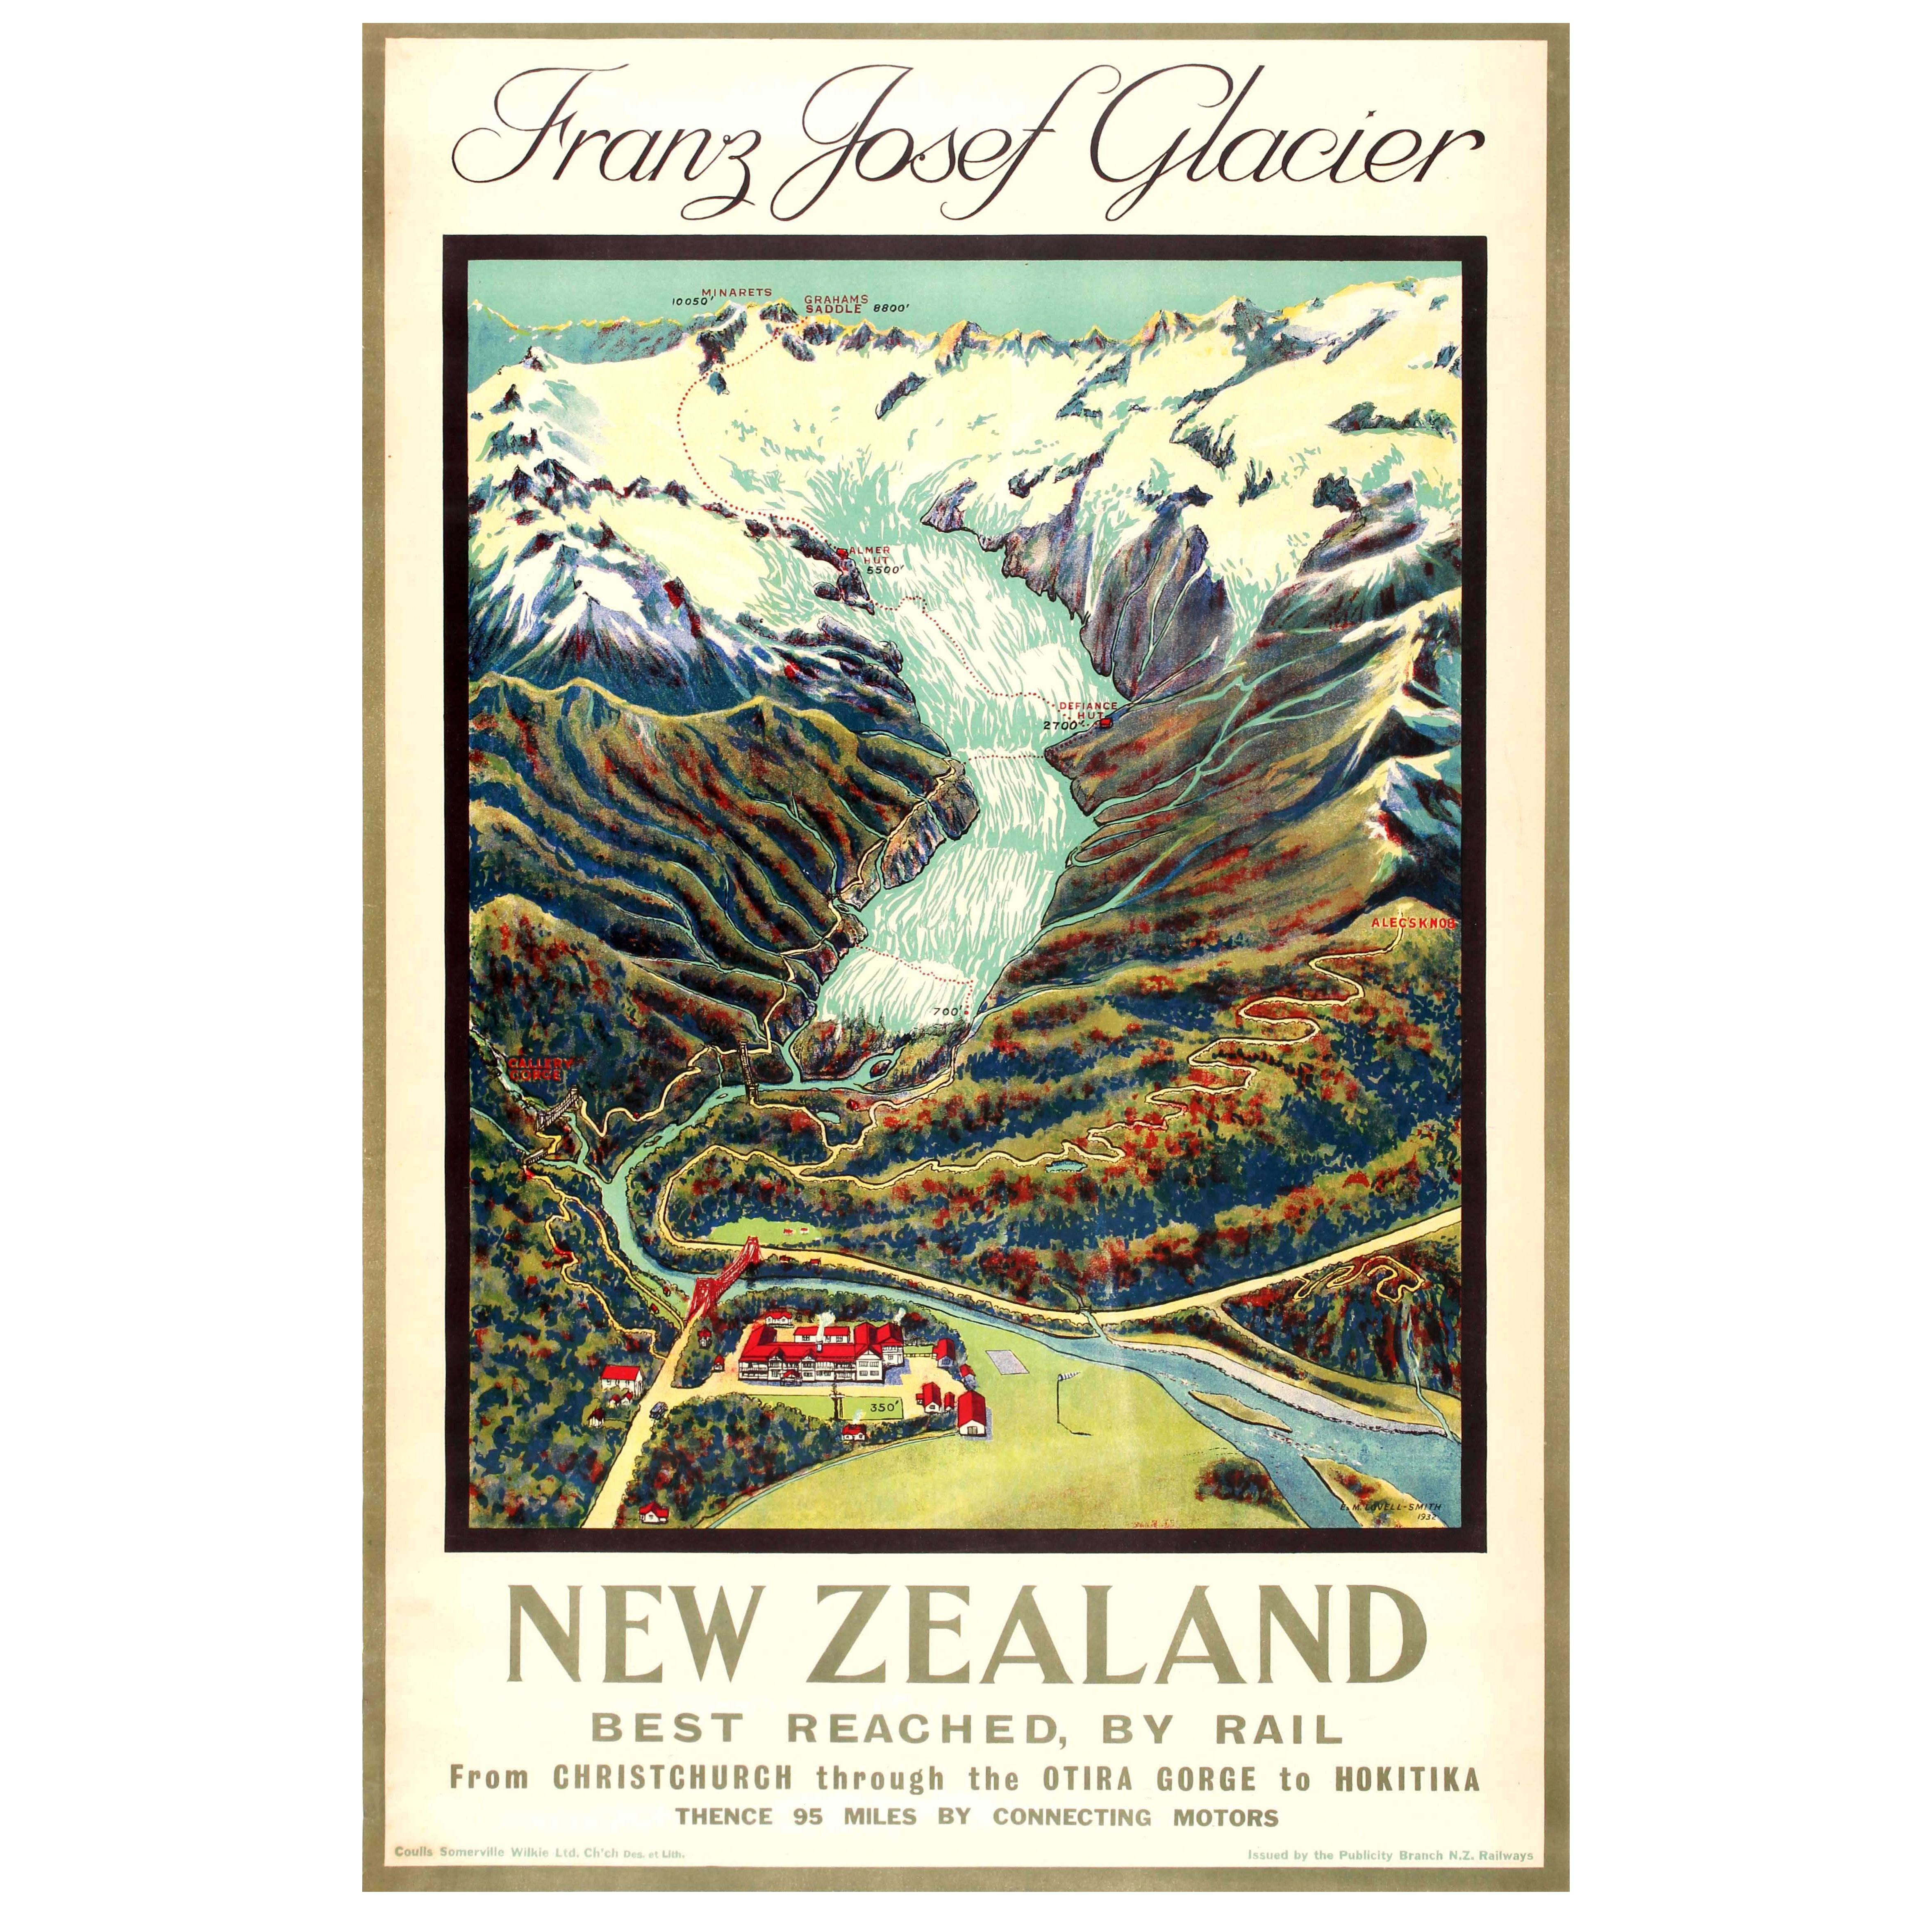 Original Vintage Rail Travel Advertising Poster: Franz Josef Glacier New Zealand